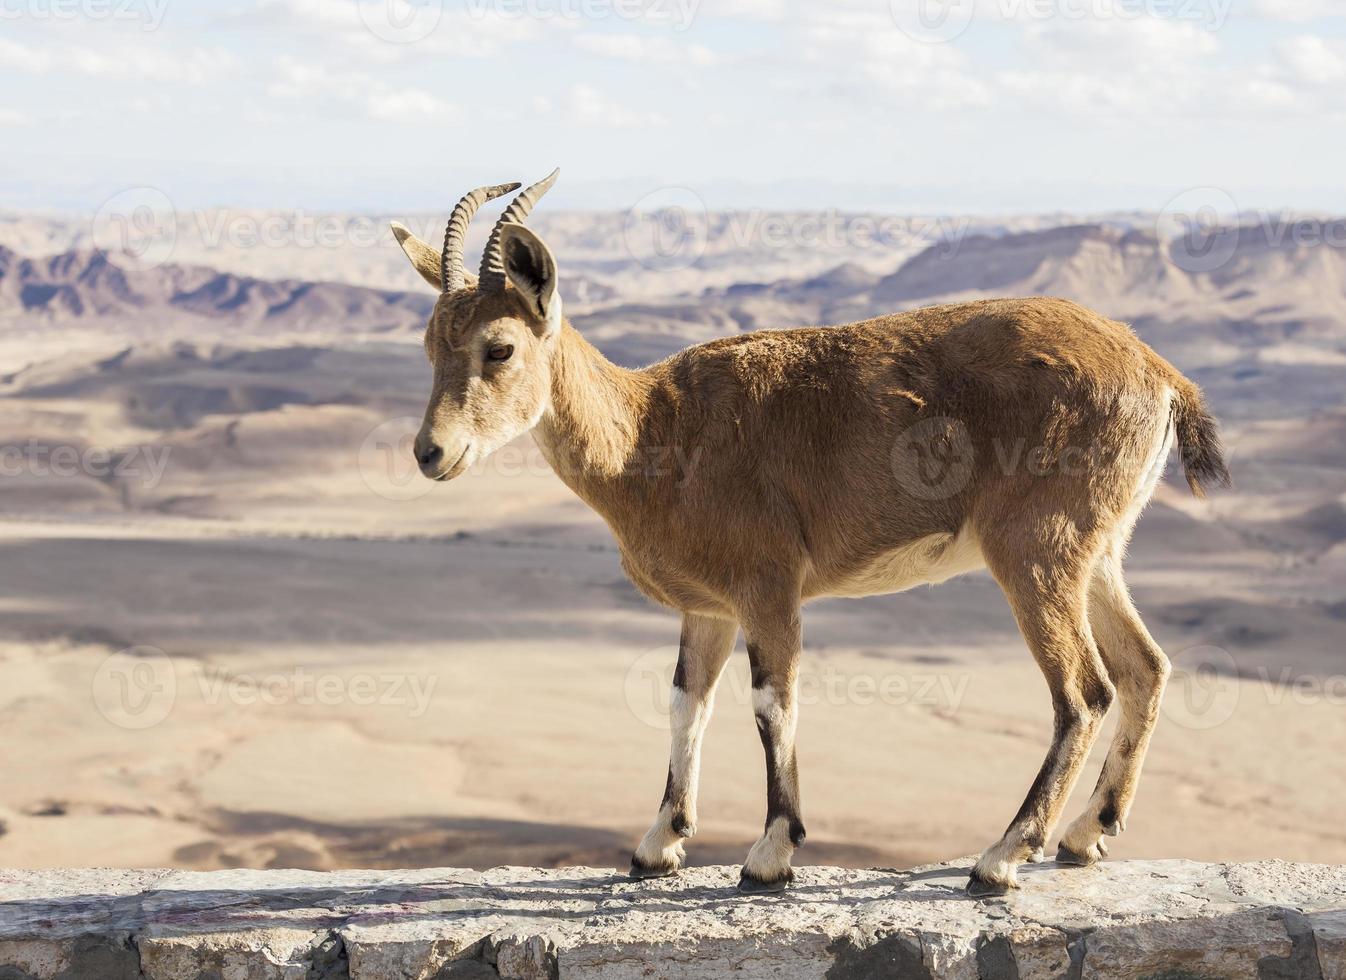 íbex núbio (capra nubiana). cratera de ramon. deserto do negev. Israel foto